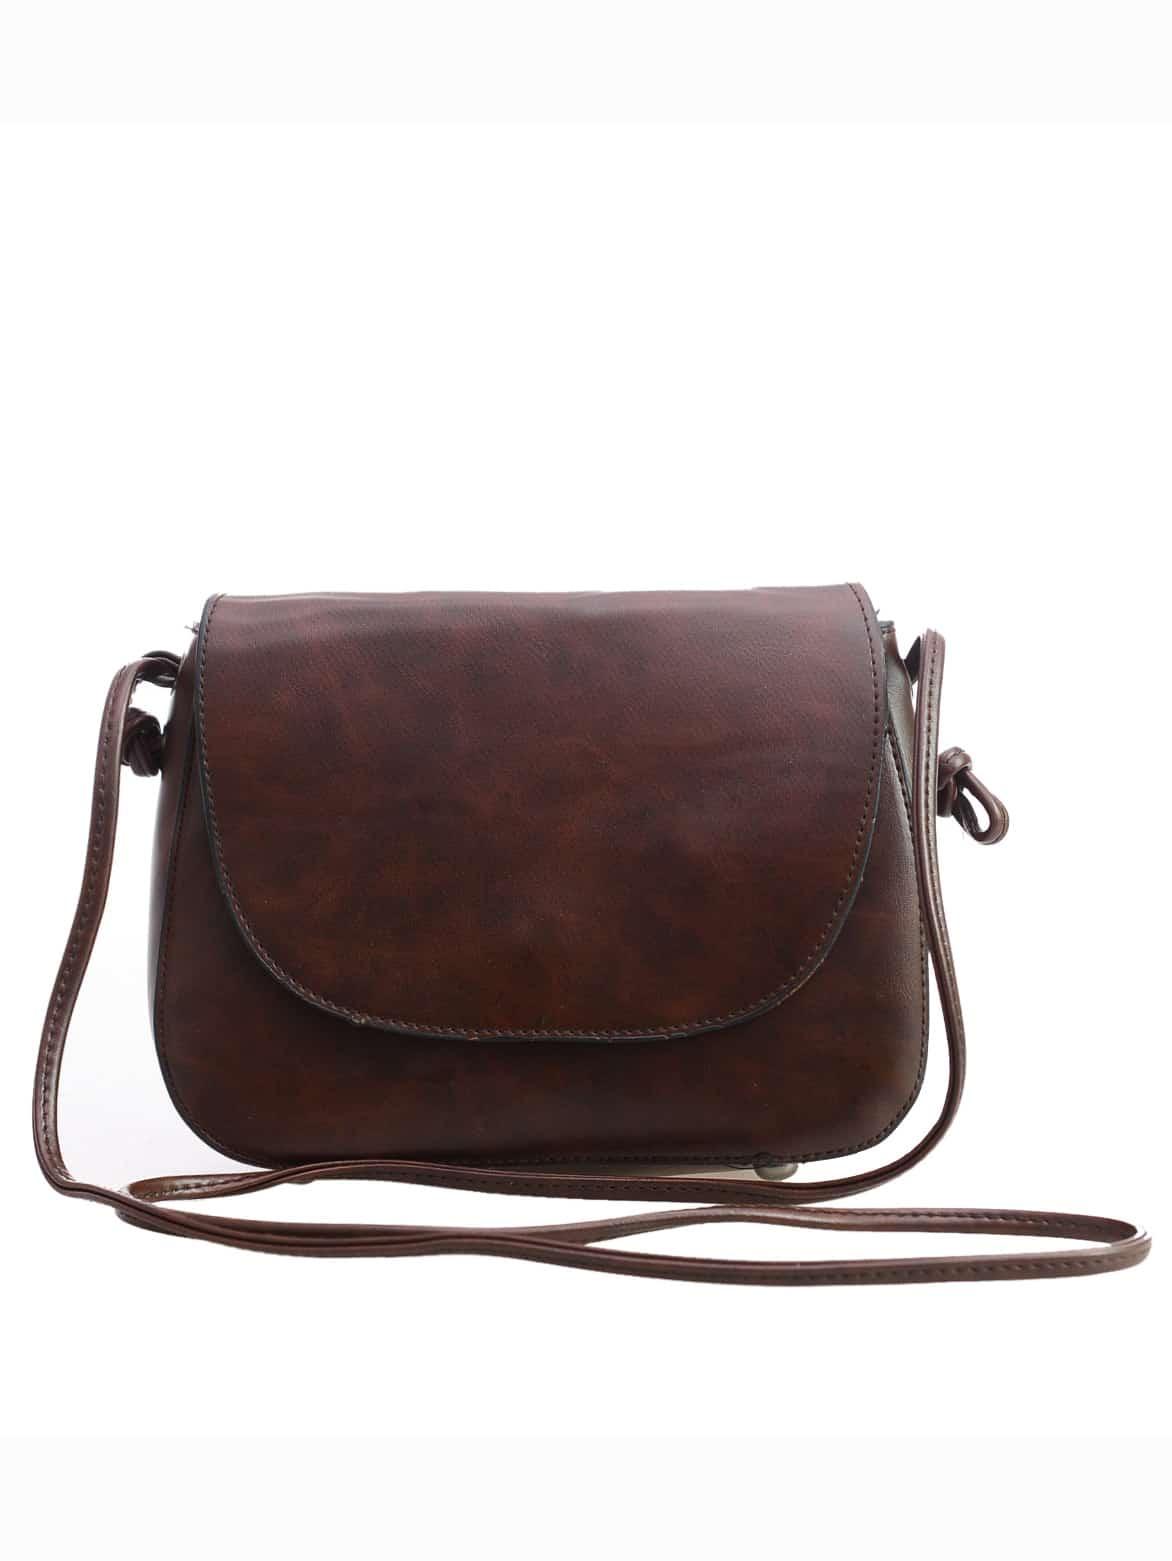 Faux Leather Magnetic Closure Saddle Bag - Dark Brown